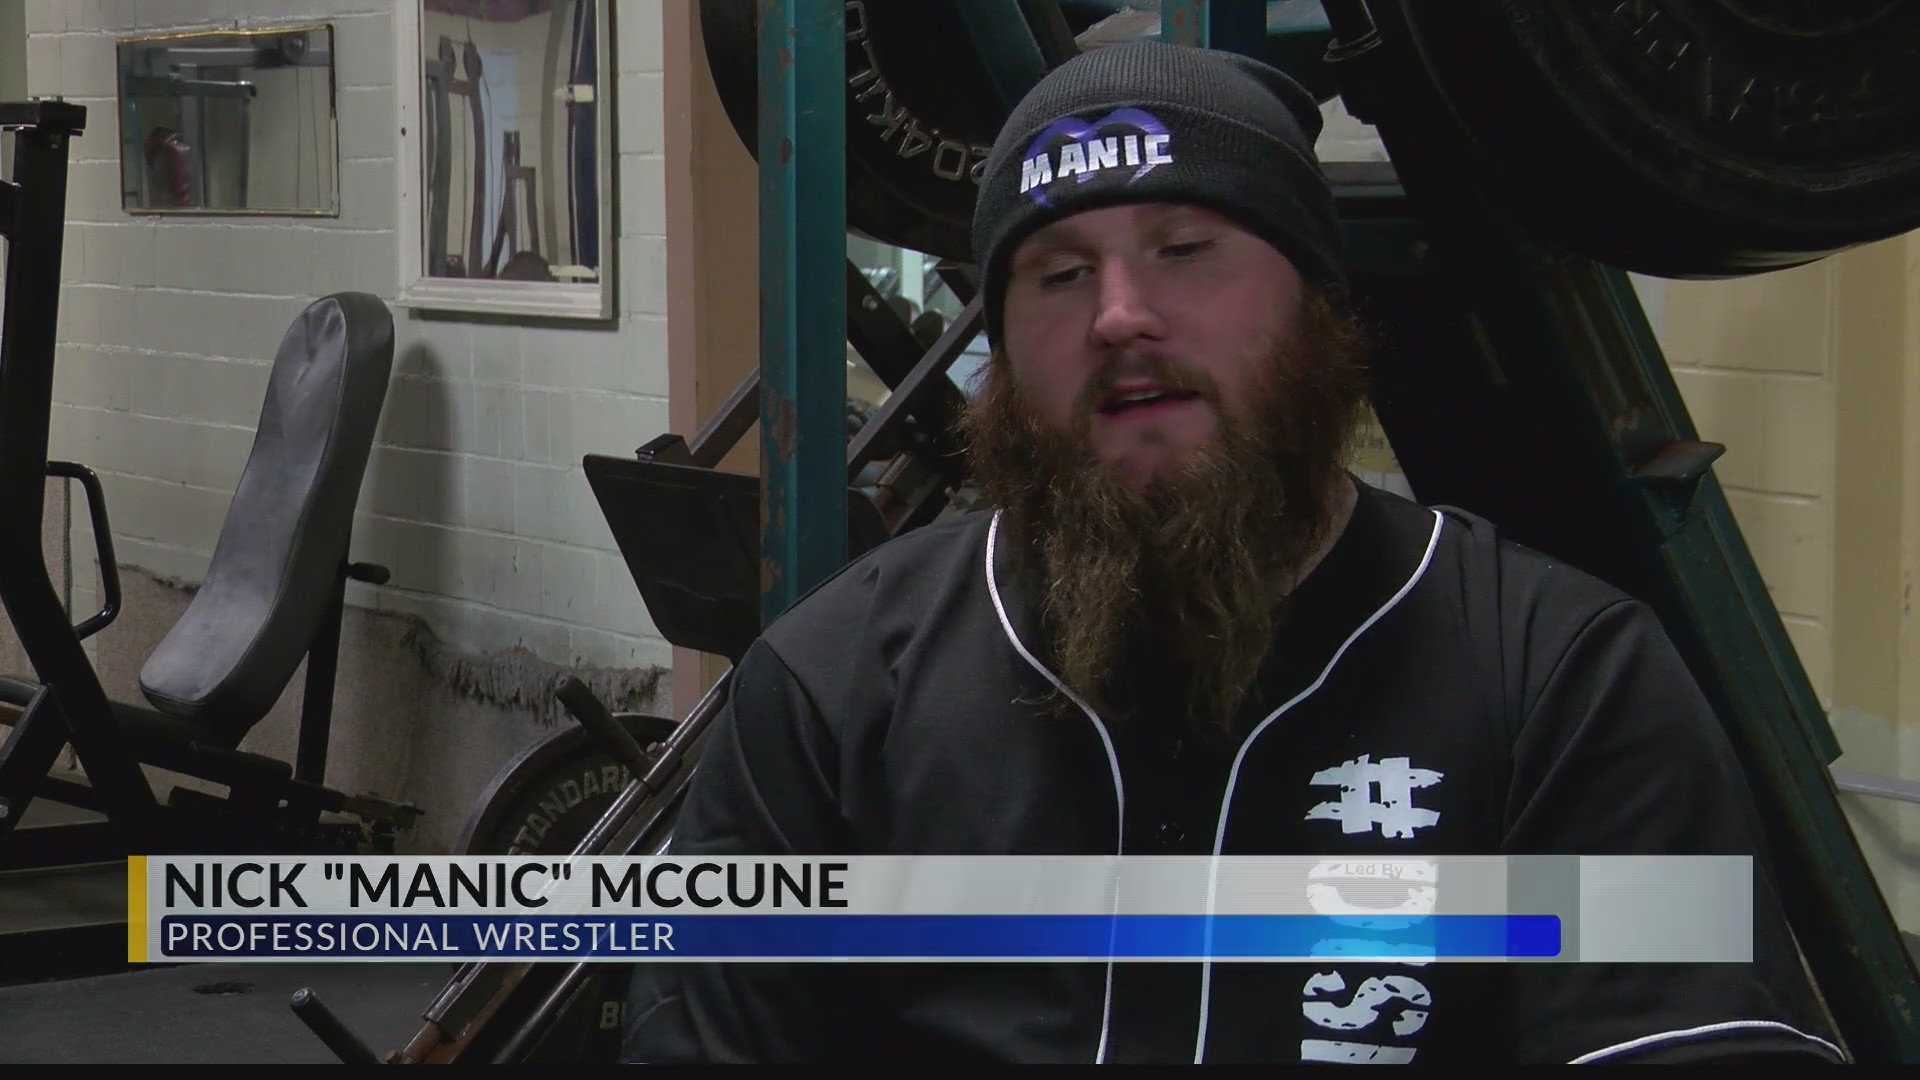 Pro Wrestler helps police at Denny's